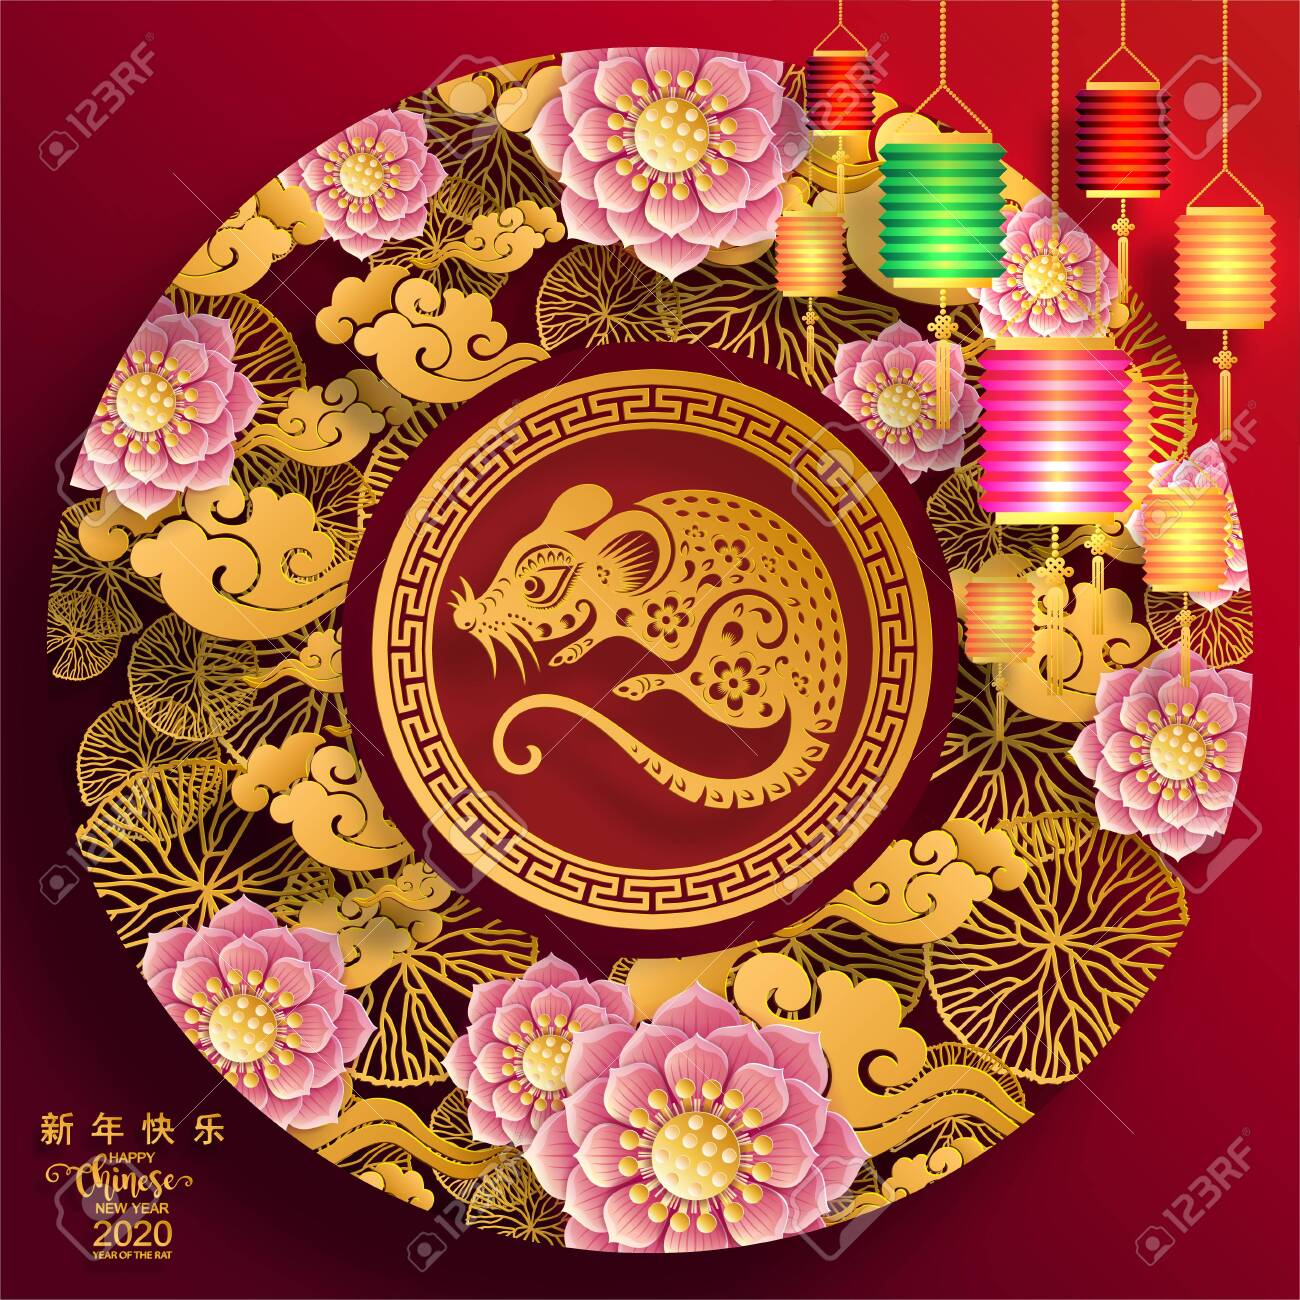 Moon Cake Festival 2020.Mid Autumn Festival Or Moon Festival With Rabbit And Moon Mooncake